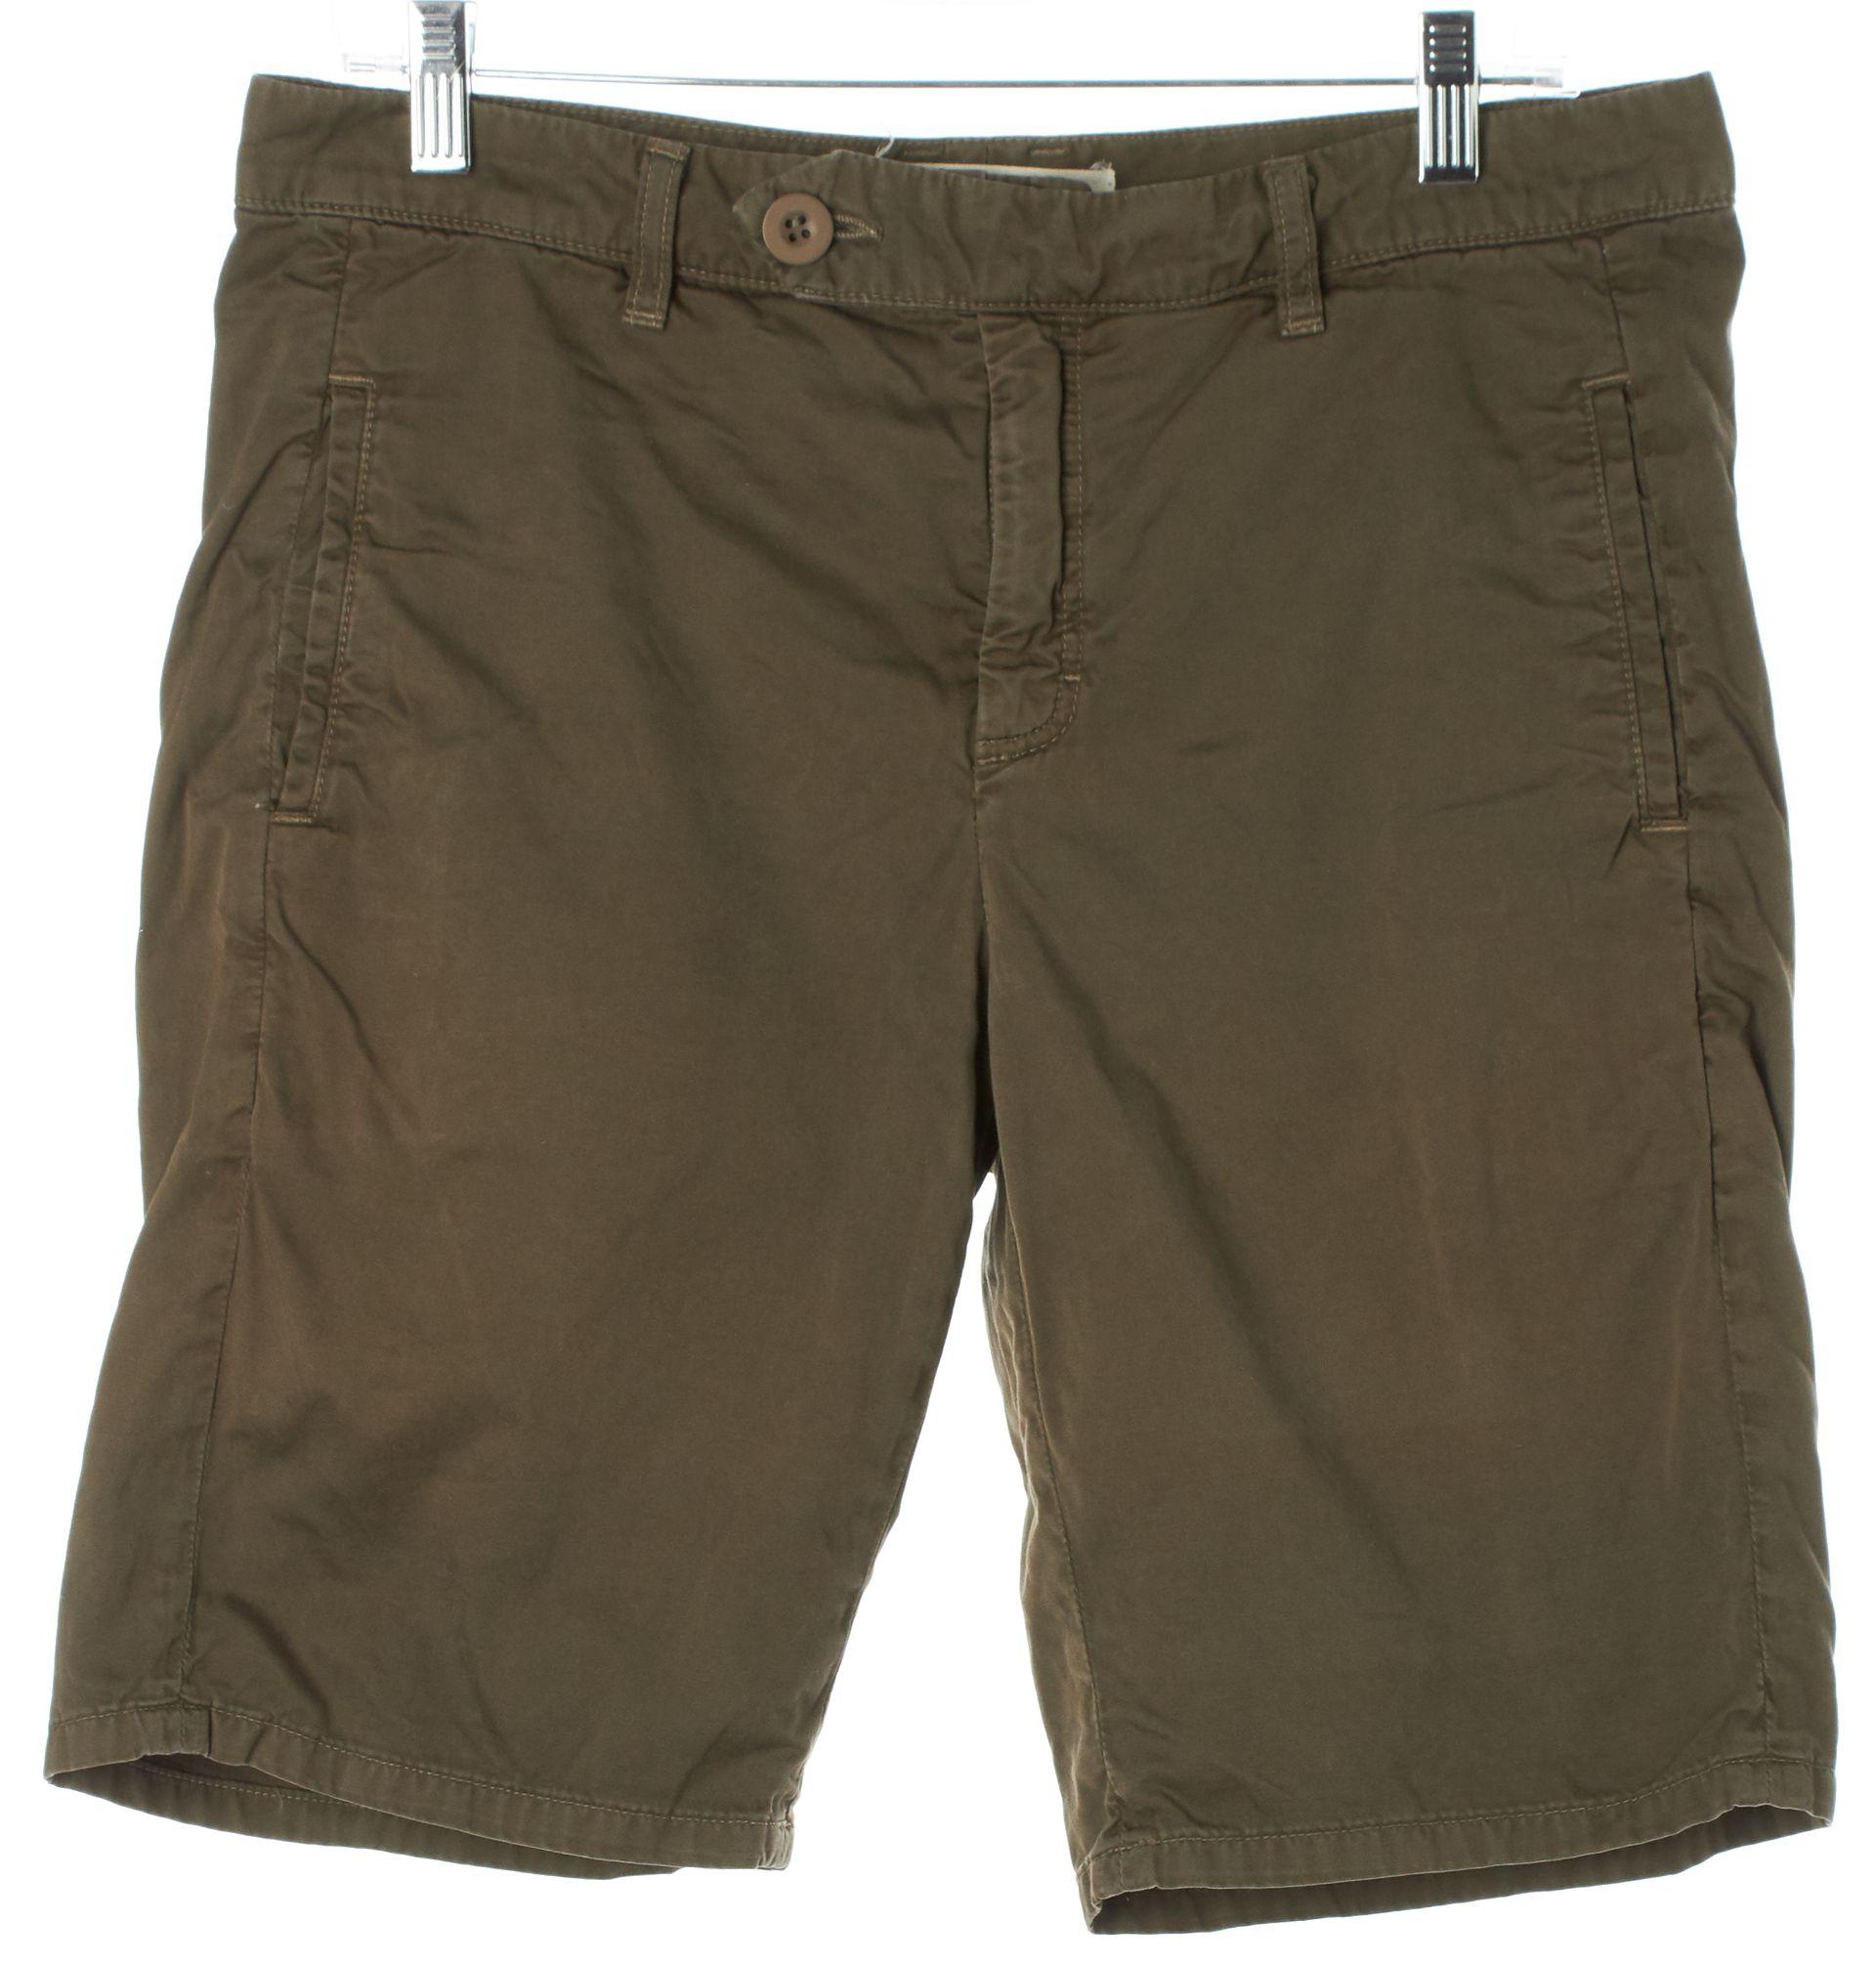 Vince Olive Green Cotton Bermuda Chino Shorts | Material World